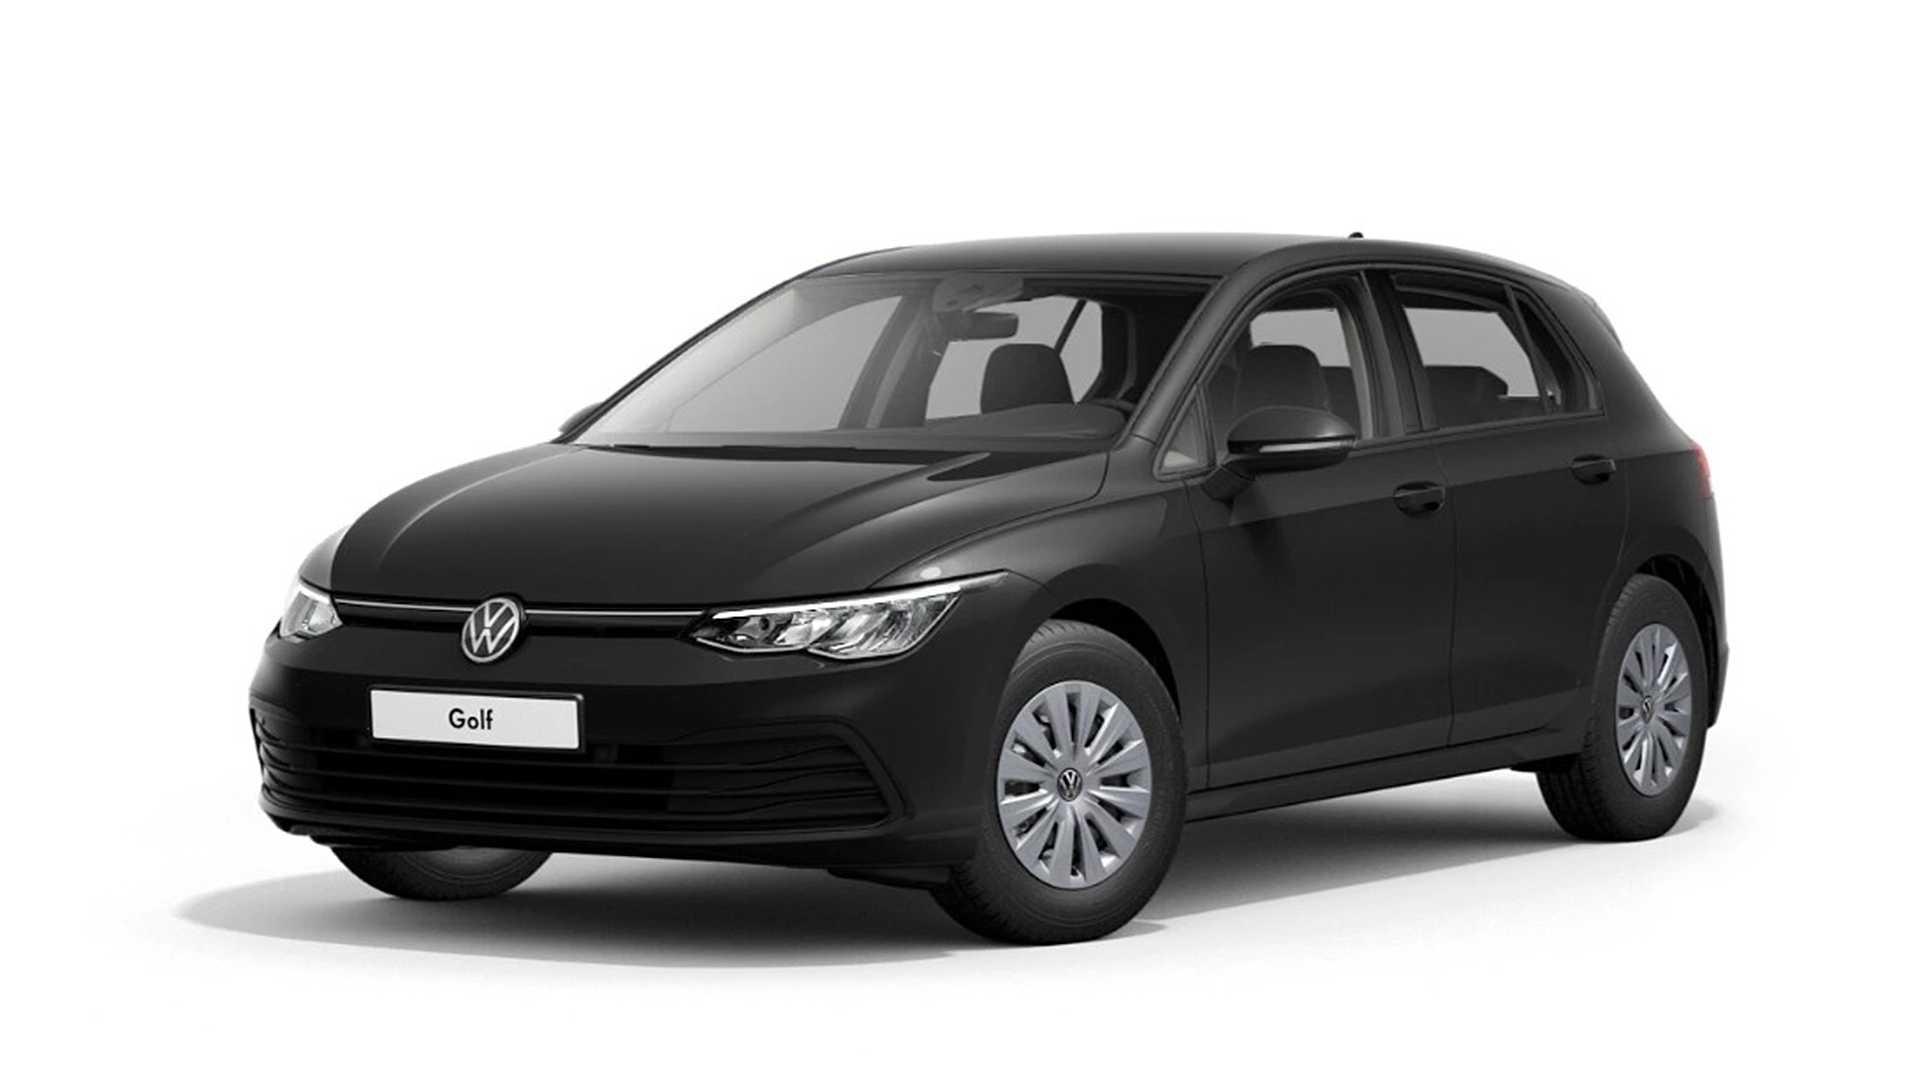 Volkswagen-Golf-2020-Base-Model-1